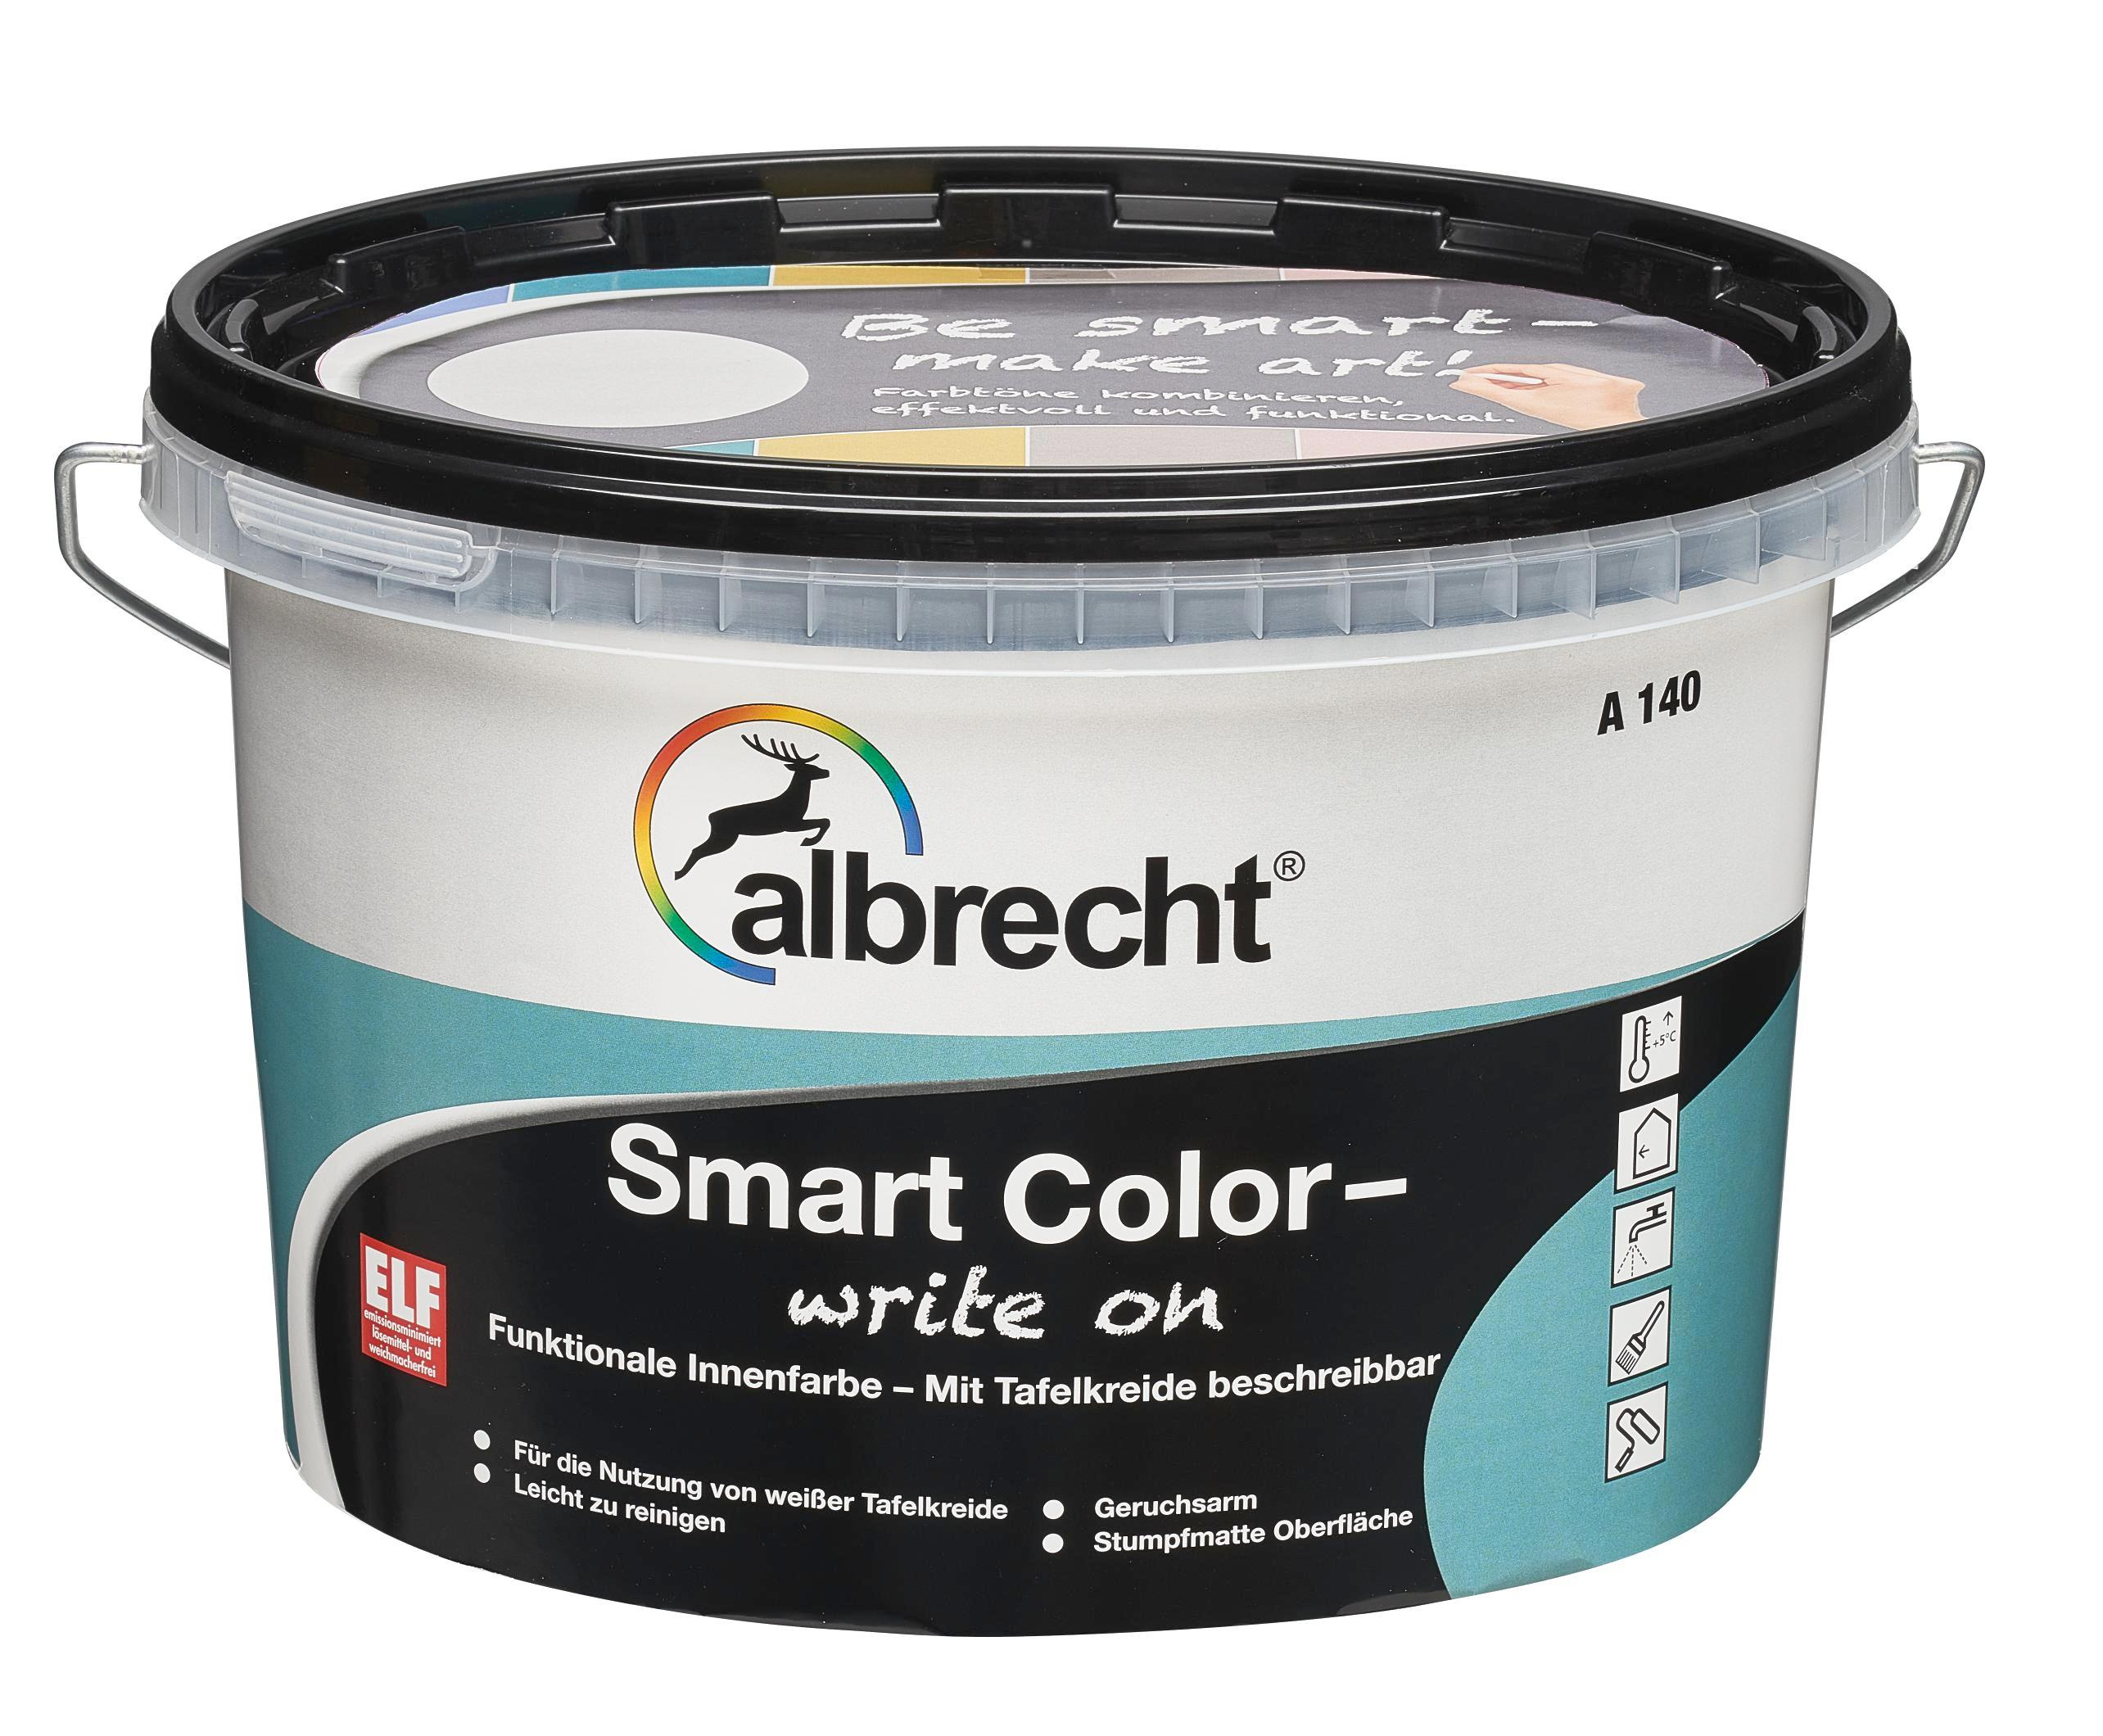 albrecht smart color write on 2 5l tafelfarbe 1 st ck altros 3400101510223502500 amazon. Black Bedroom Furniture Sets. Home Design Ideas